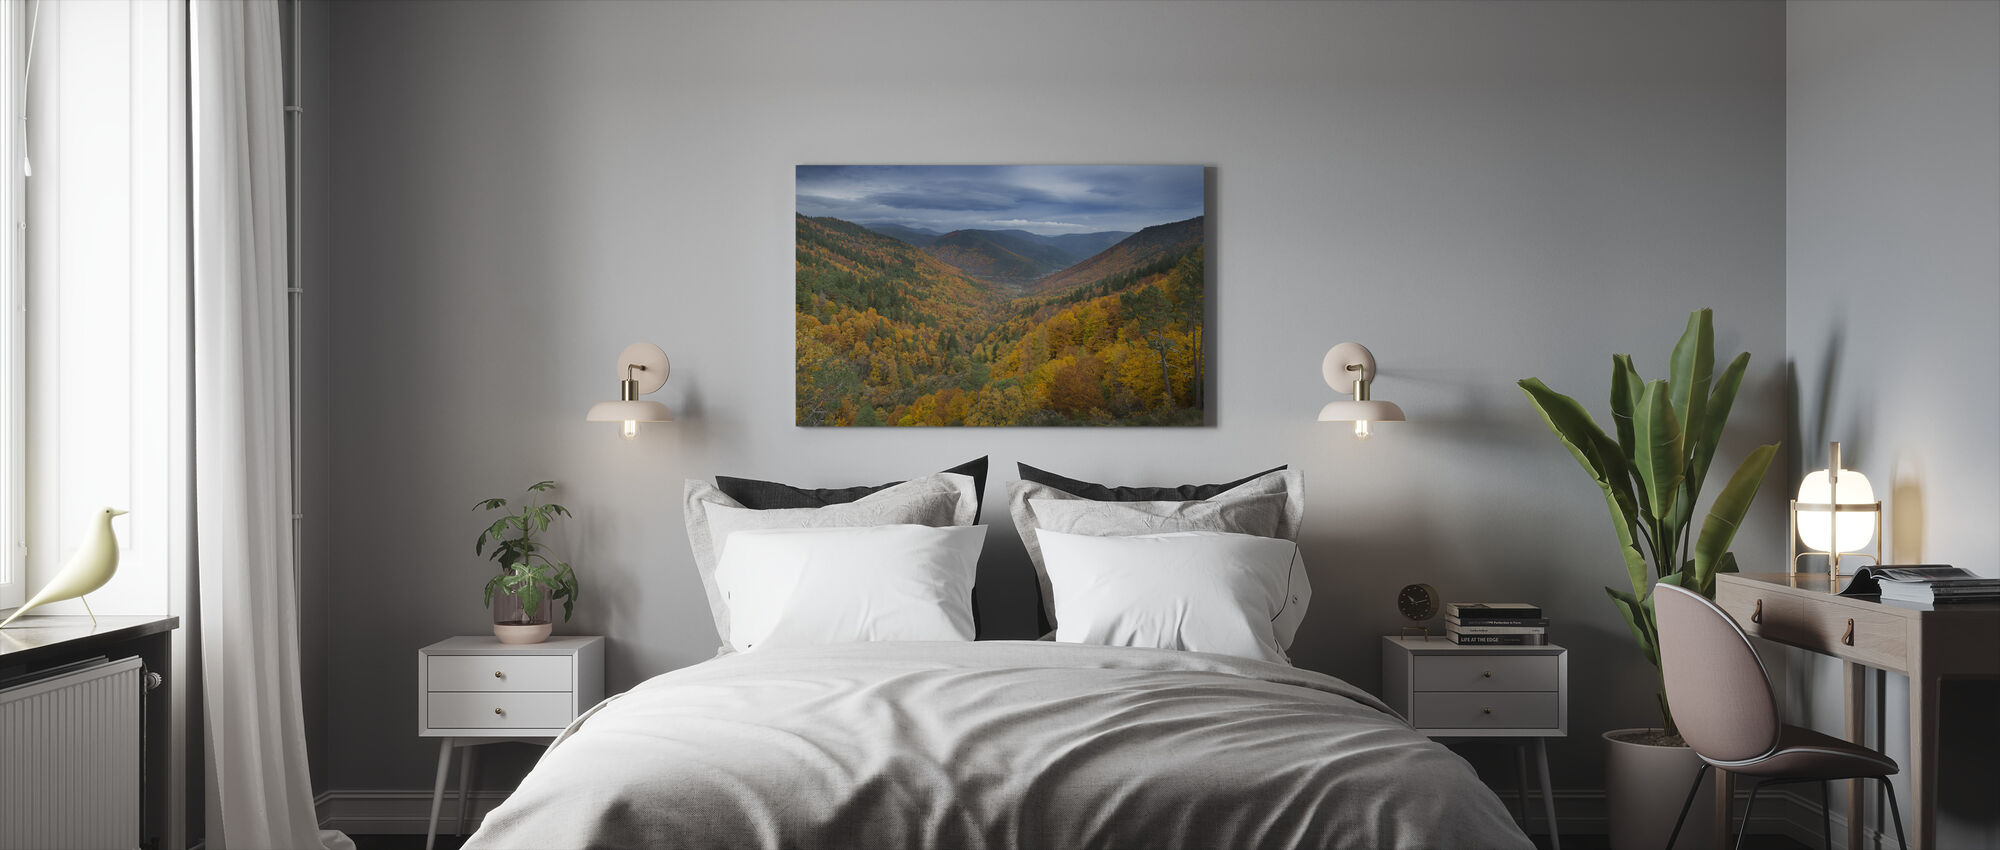 Bos in het Estrela gebergte - Canvas print - Slaapkamer